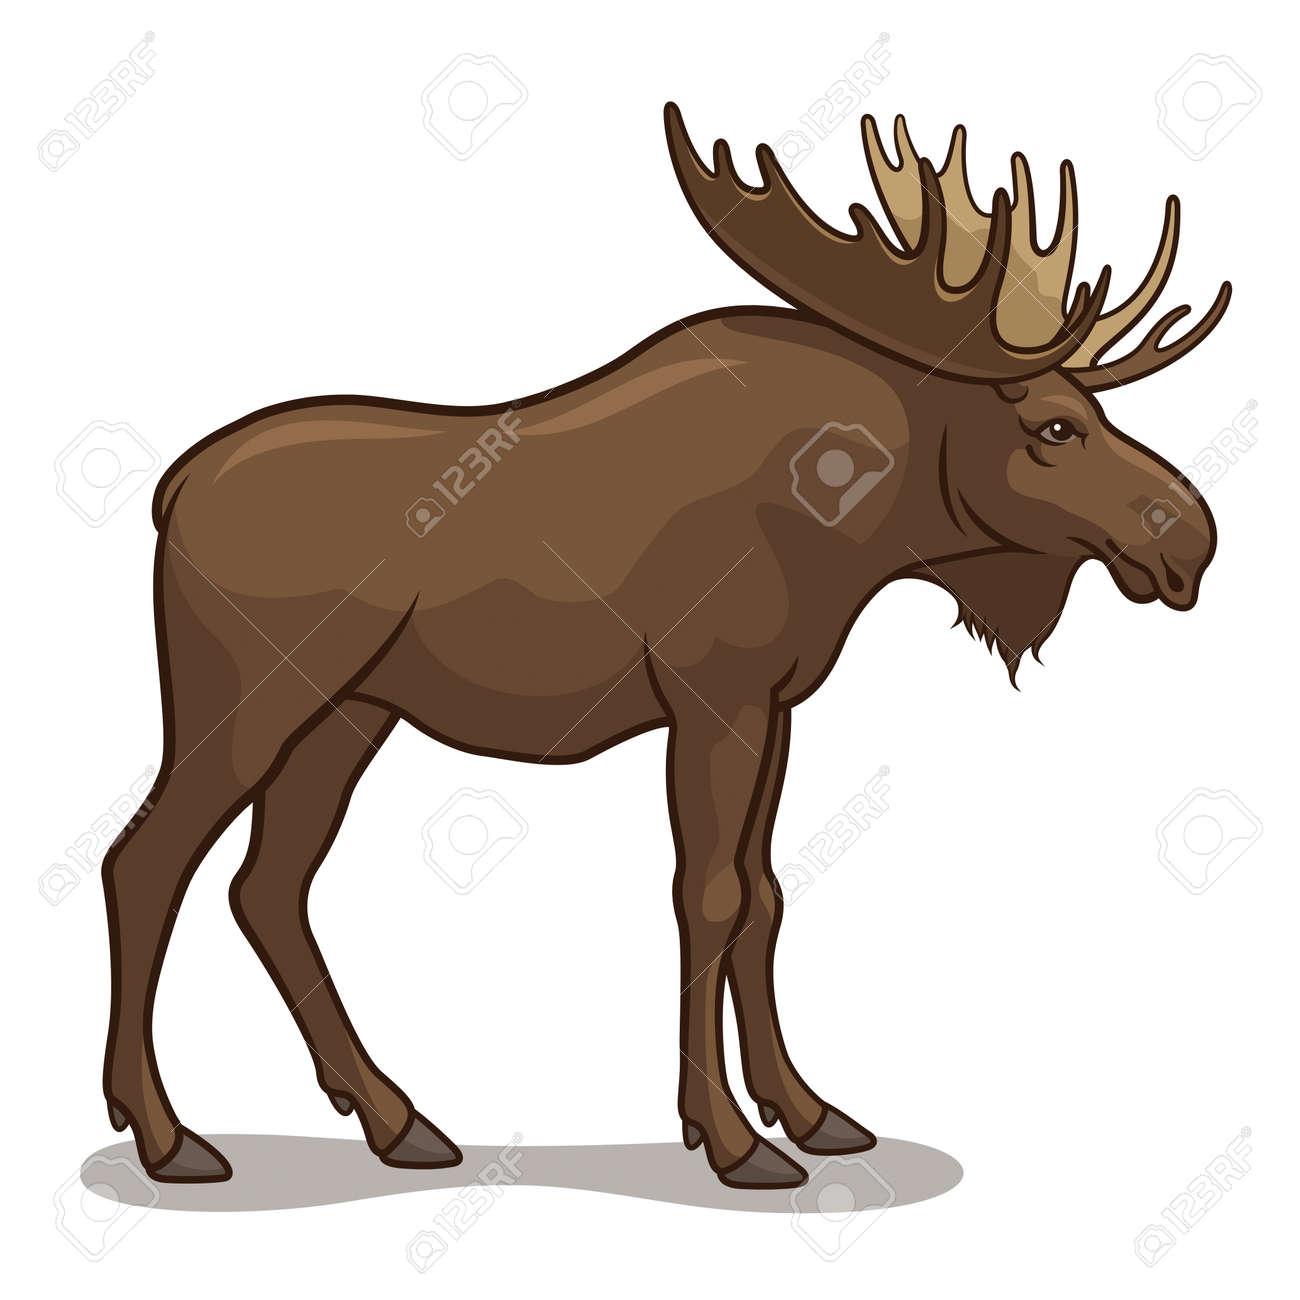 2,153 Elk Head Stock Vector Illustration And Royalty Free Elk Head ...